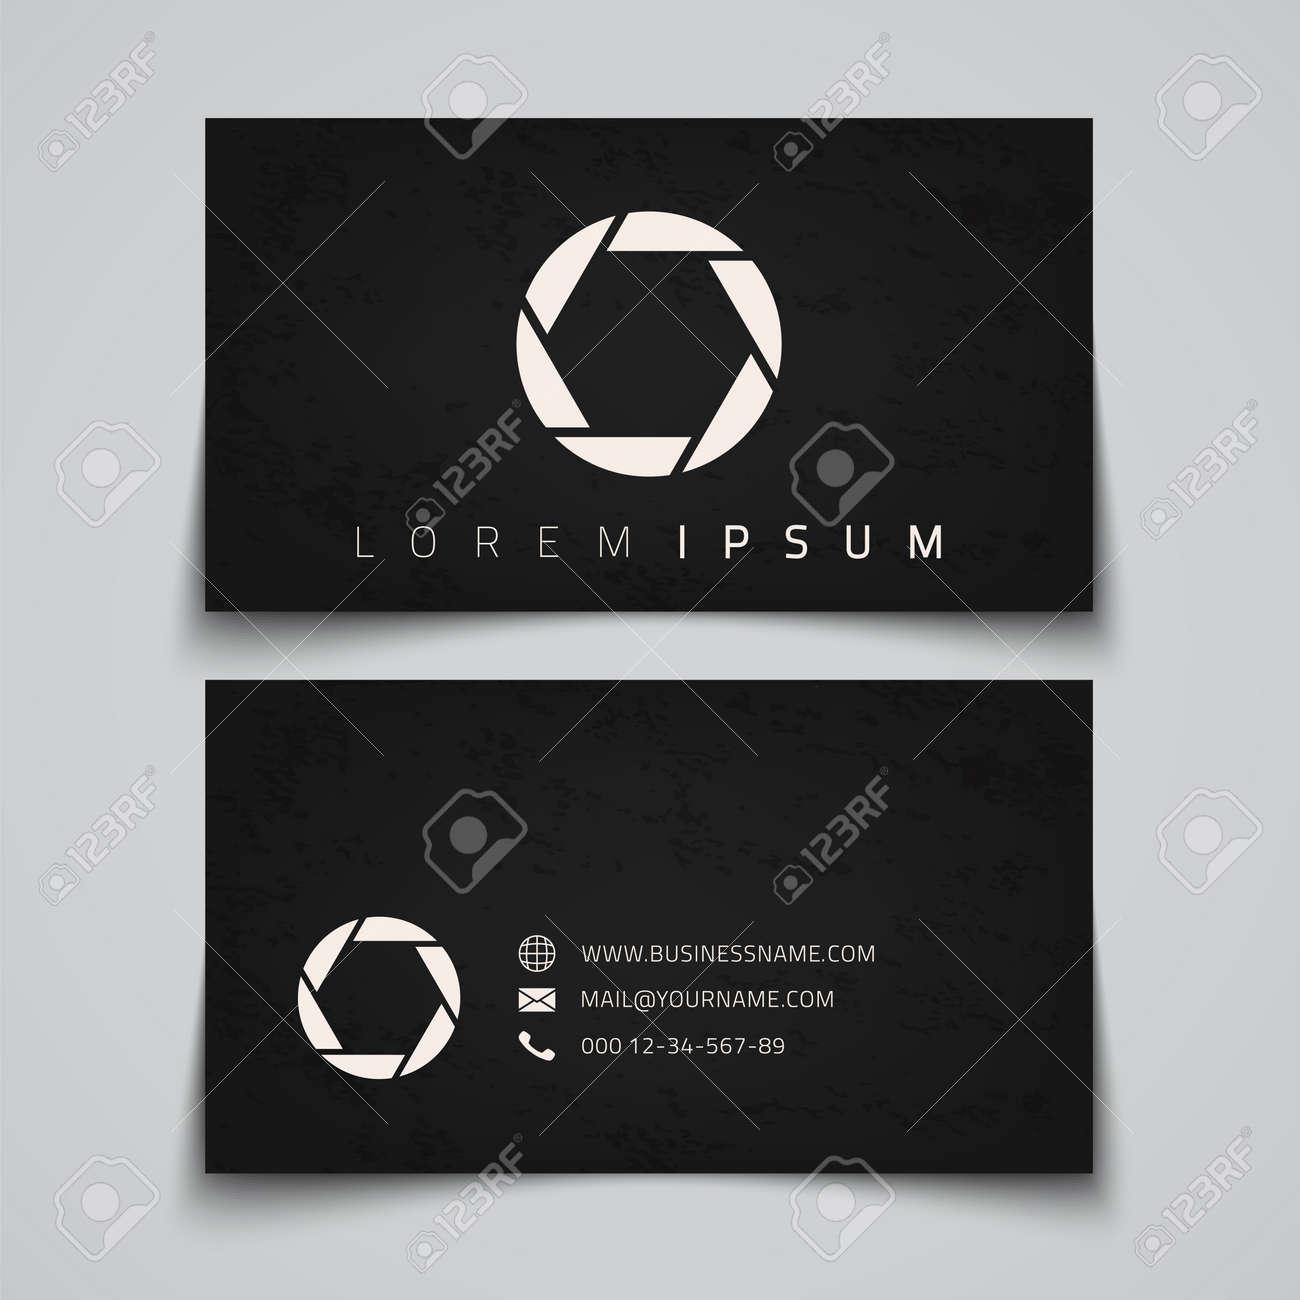 Business card template camera shutter concept logo vector banco de imagens business card template camera shutter concept logo vector illustration reheart Gallery